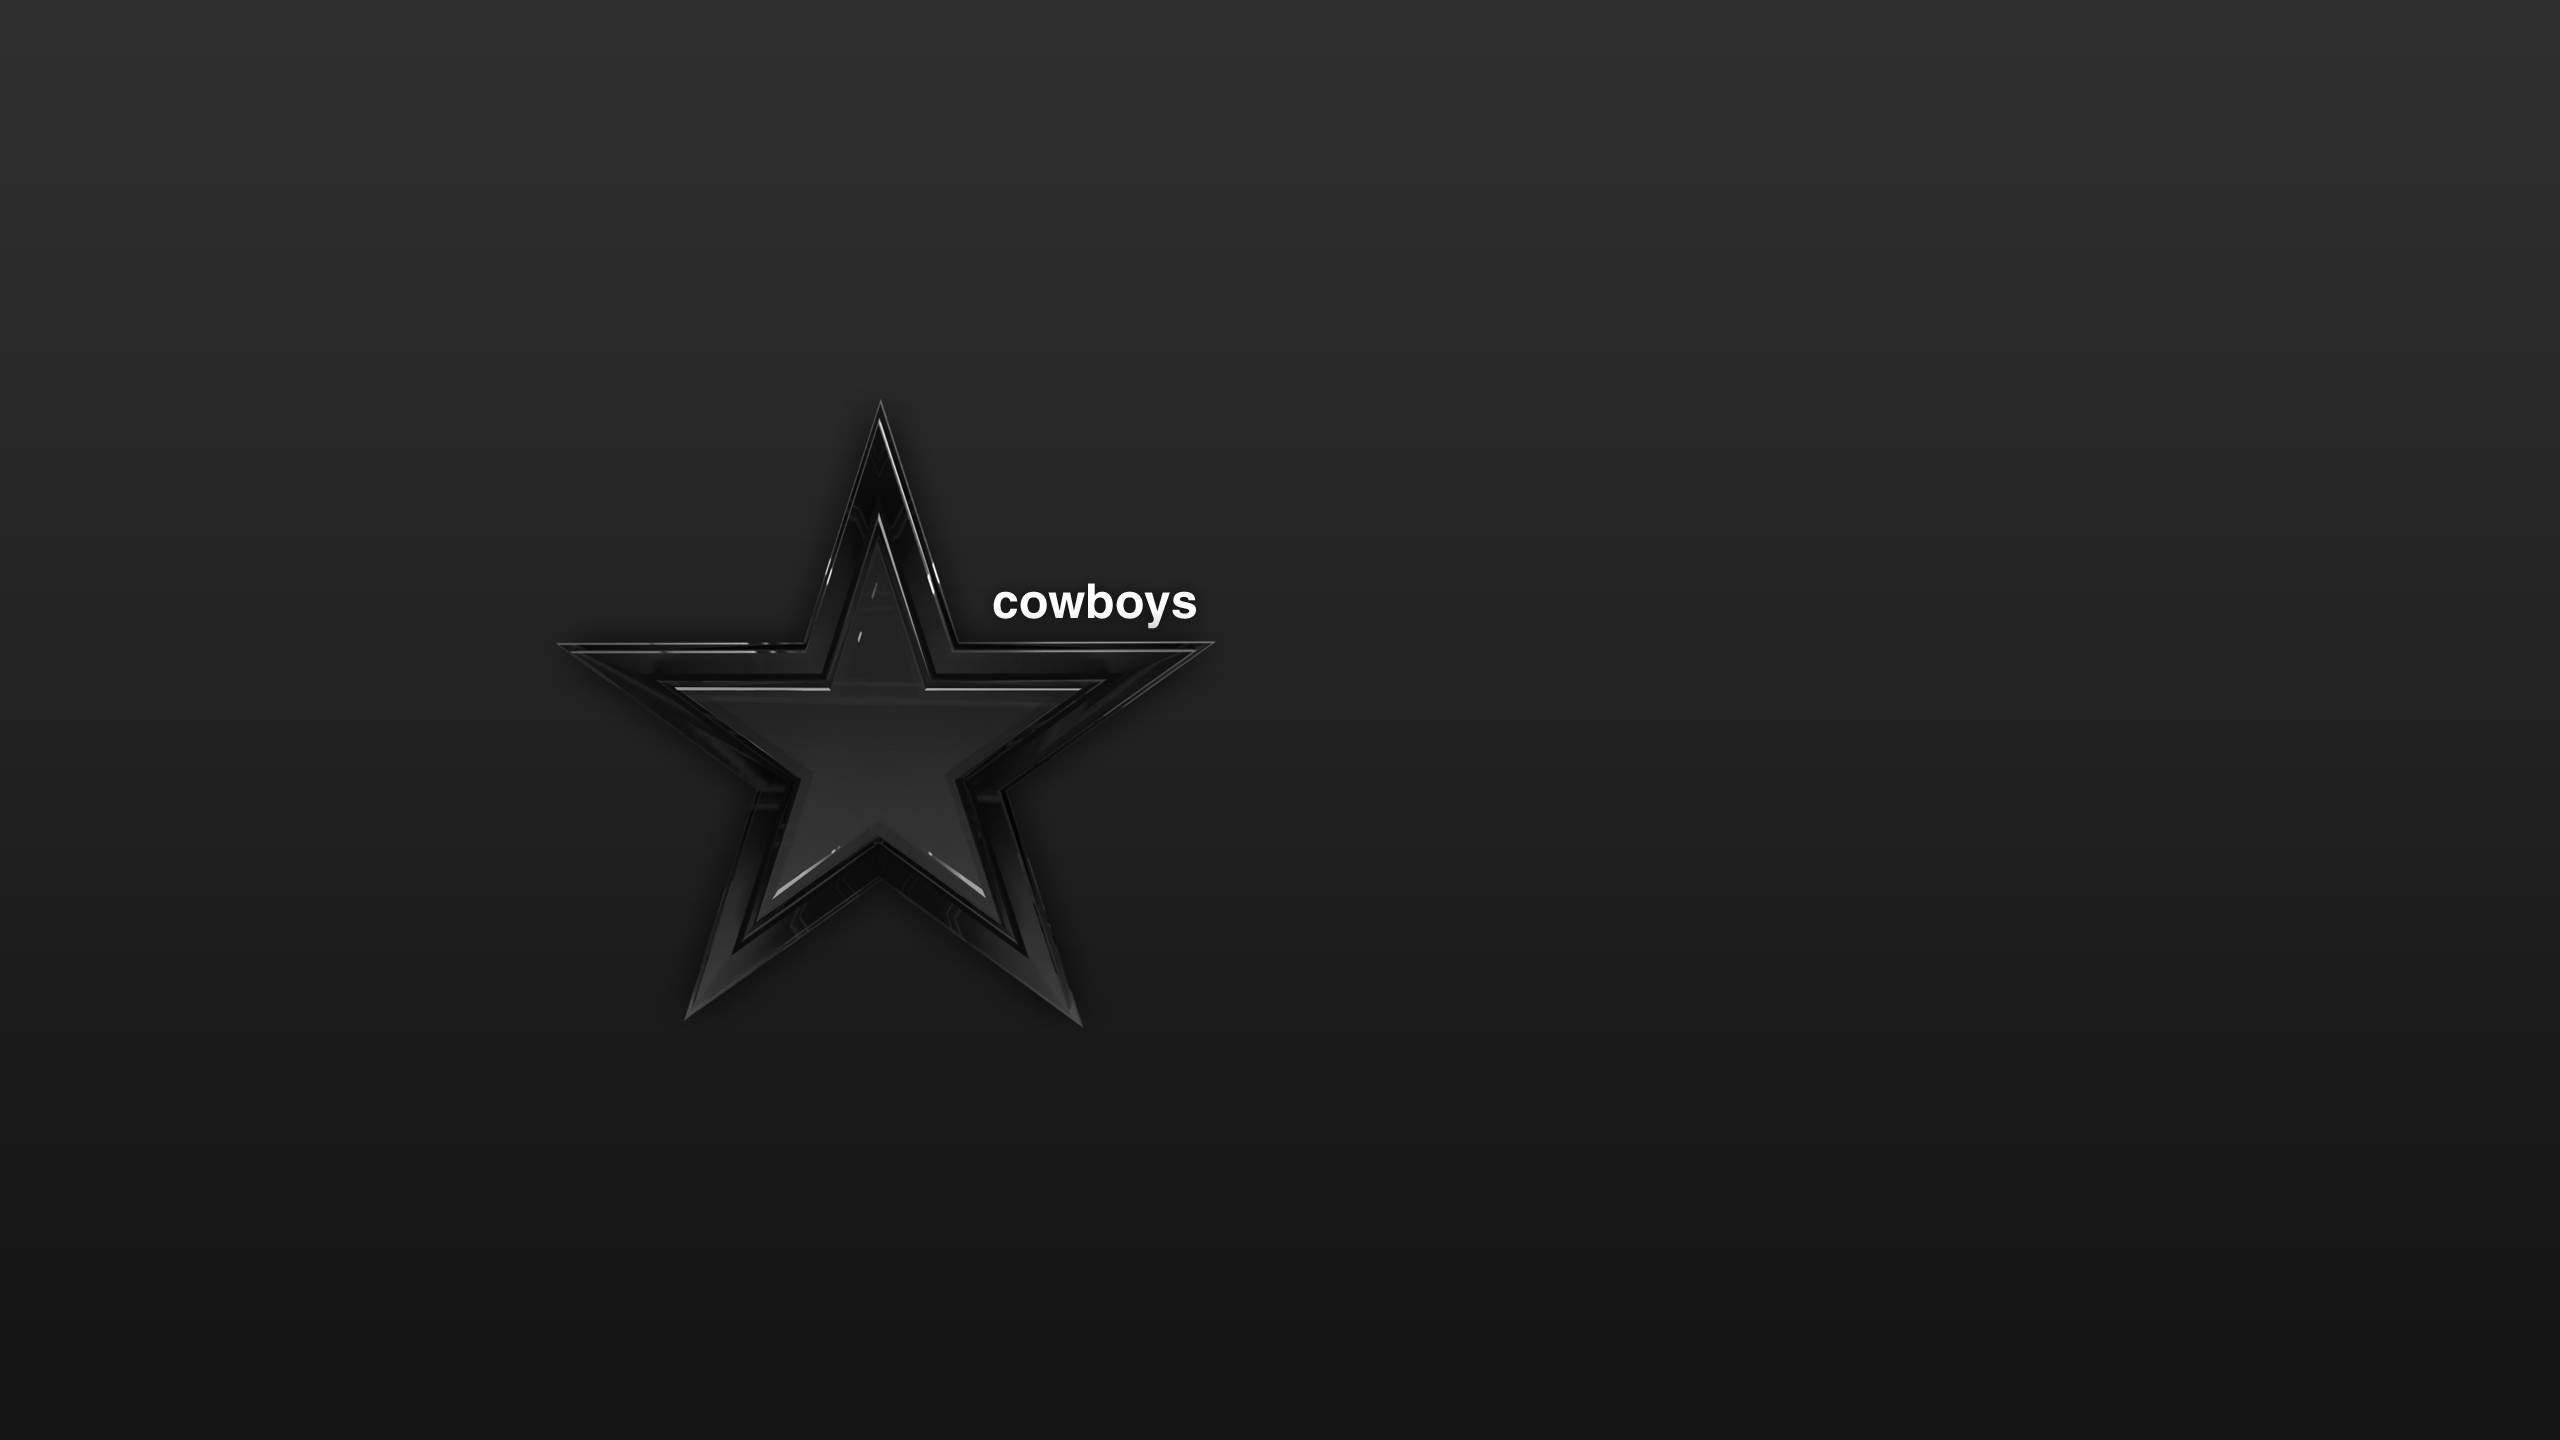 Dallas Cowboys HD desktop wallpaper High Definition Fullscreen